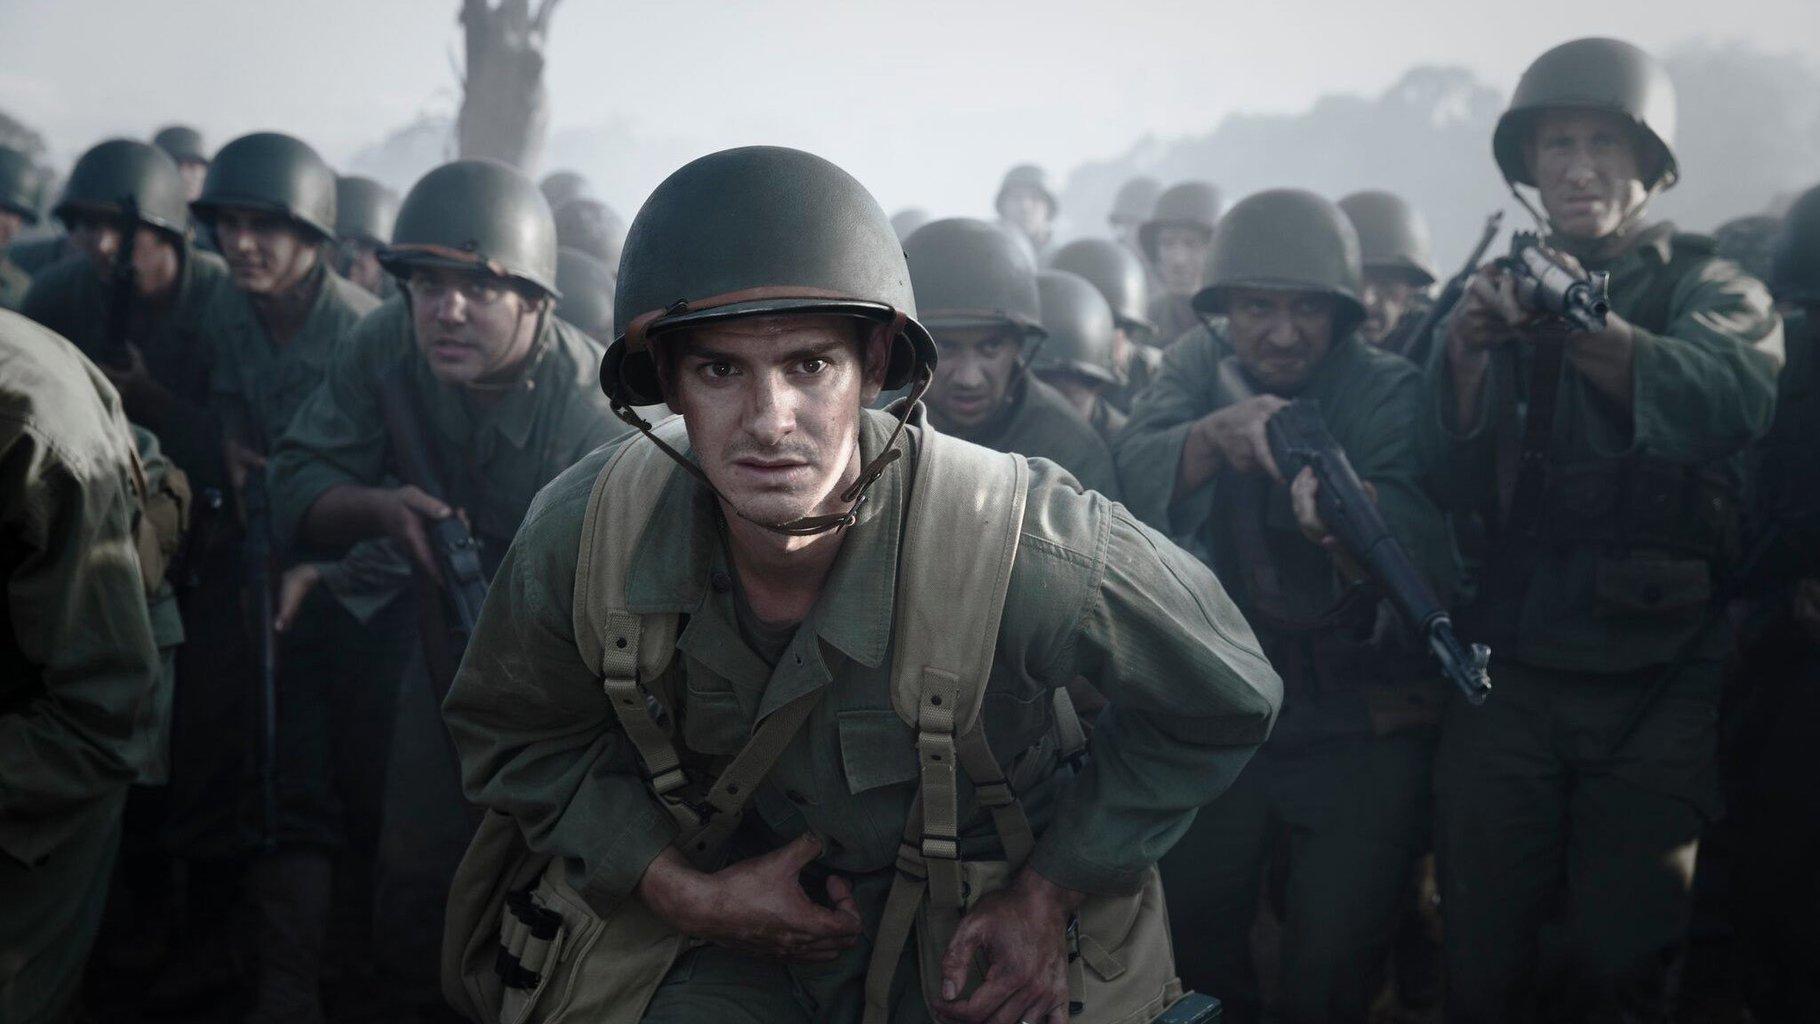 15 Best War Movies On Netflix For Your Next Movie Night 2019 « HDDMag